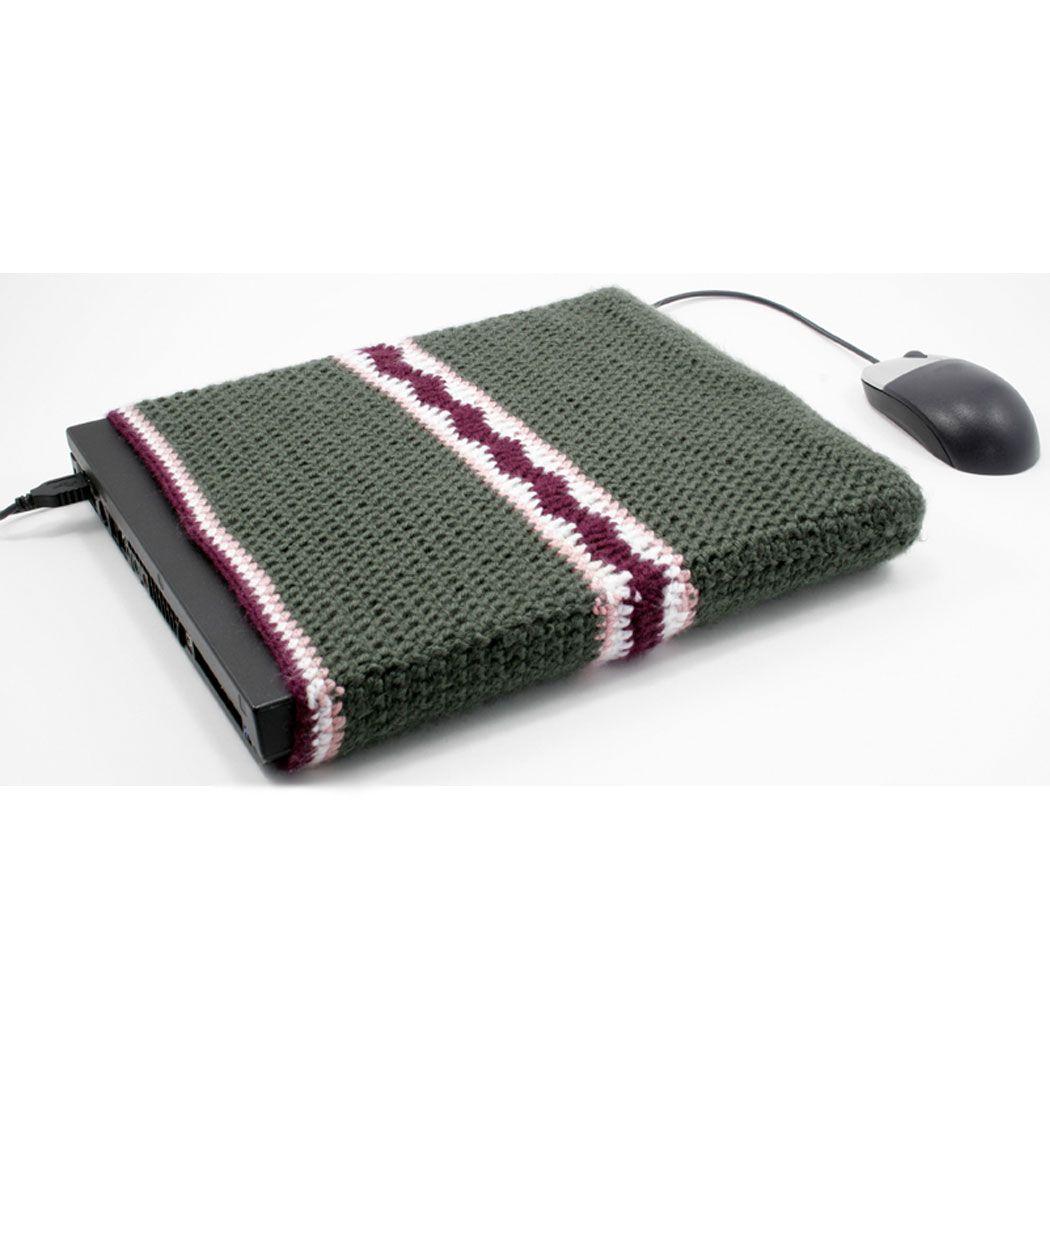 Crochet Laptop Cover: free pattern